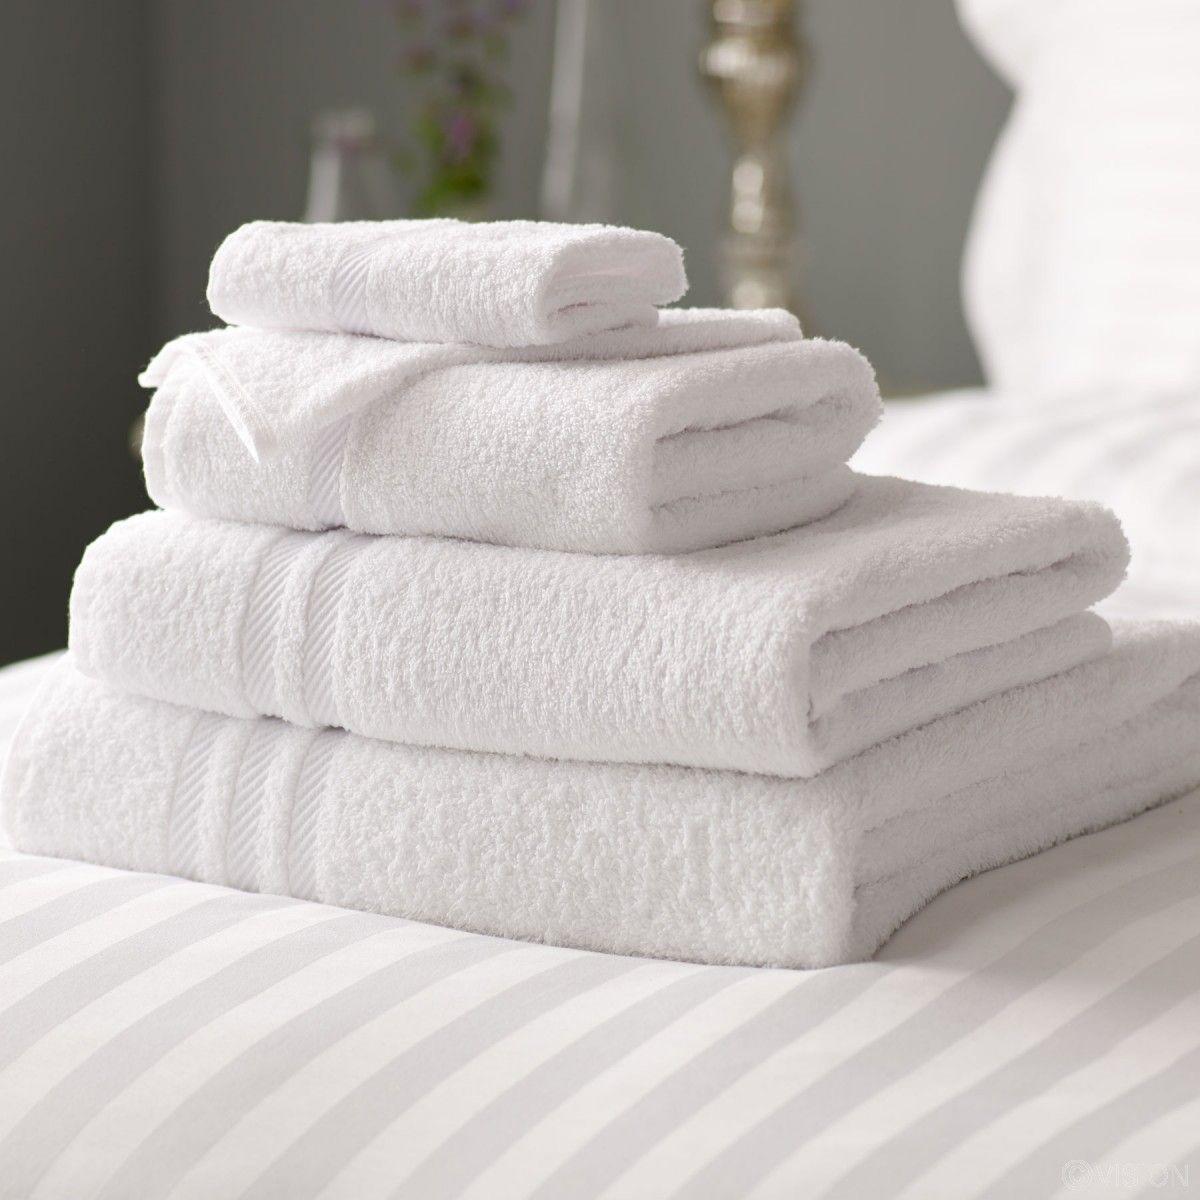 Lowry White Bath Sheet The Lowry 100 Cotton Large Bath Sheet